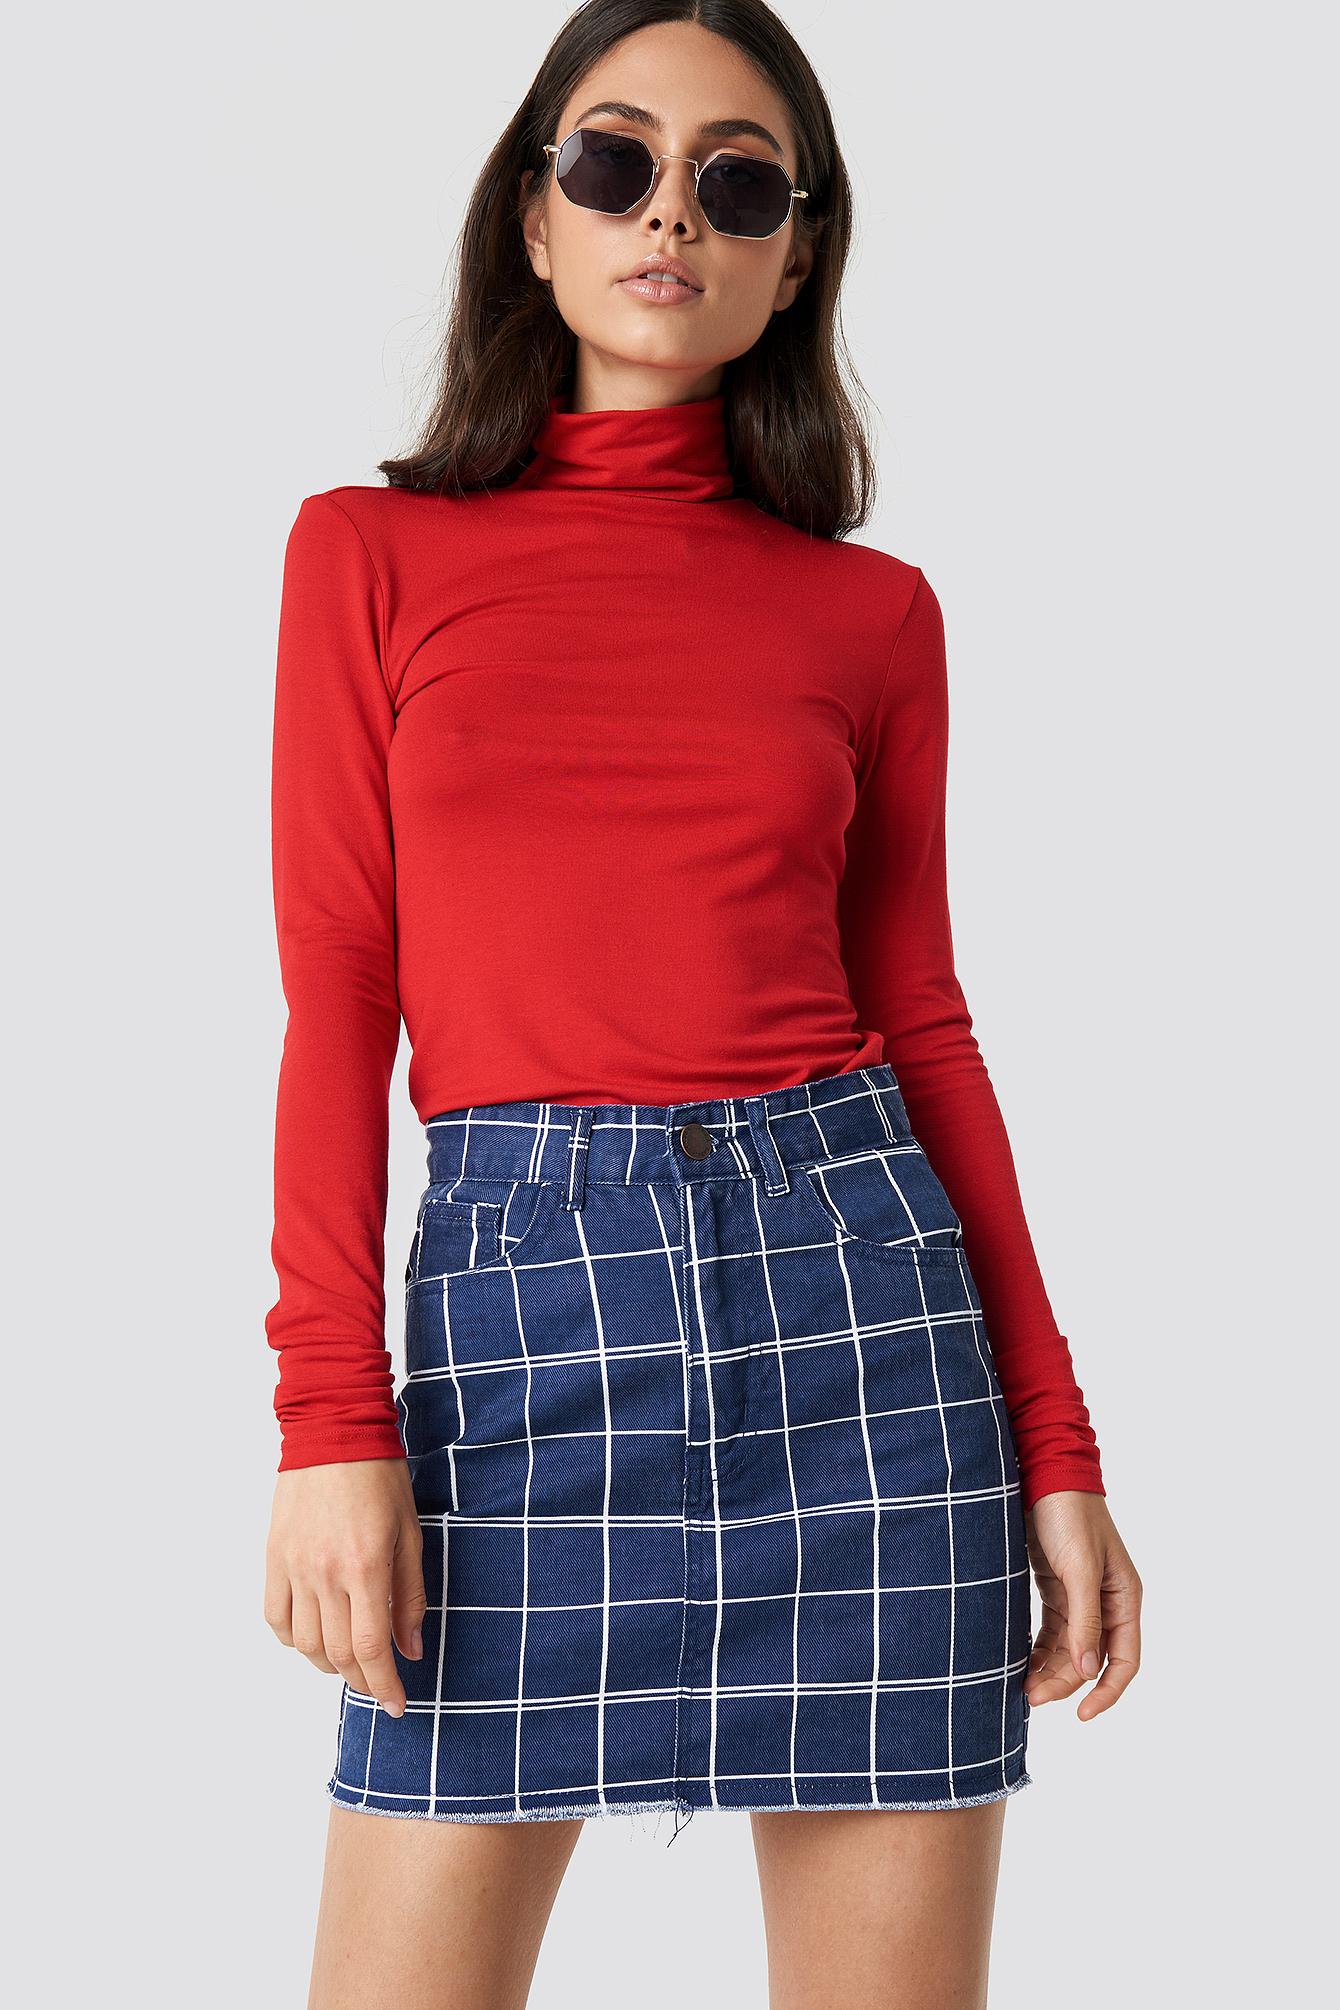 lasula -  Denim Raw Hem Checkered Skirt - Blue